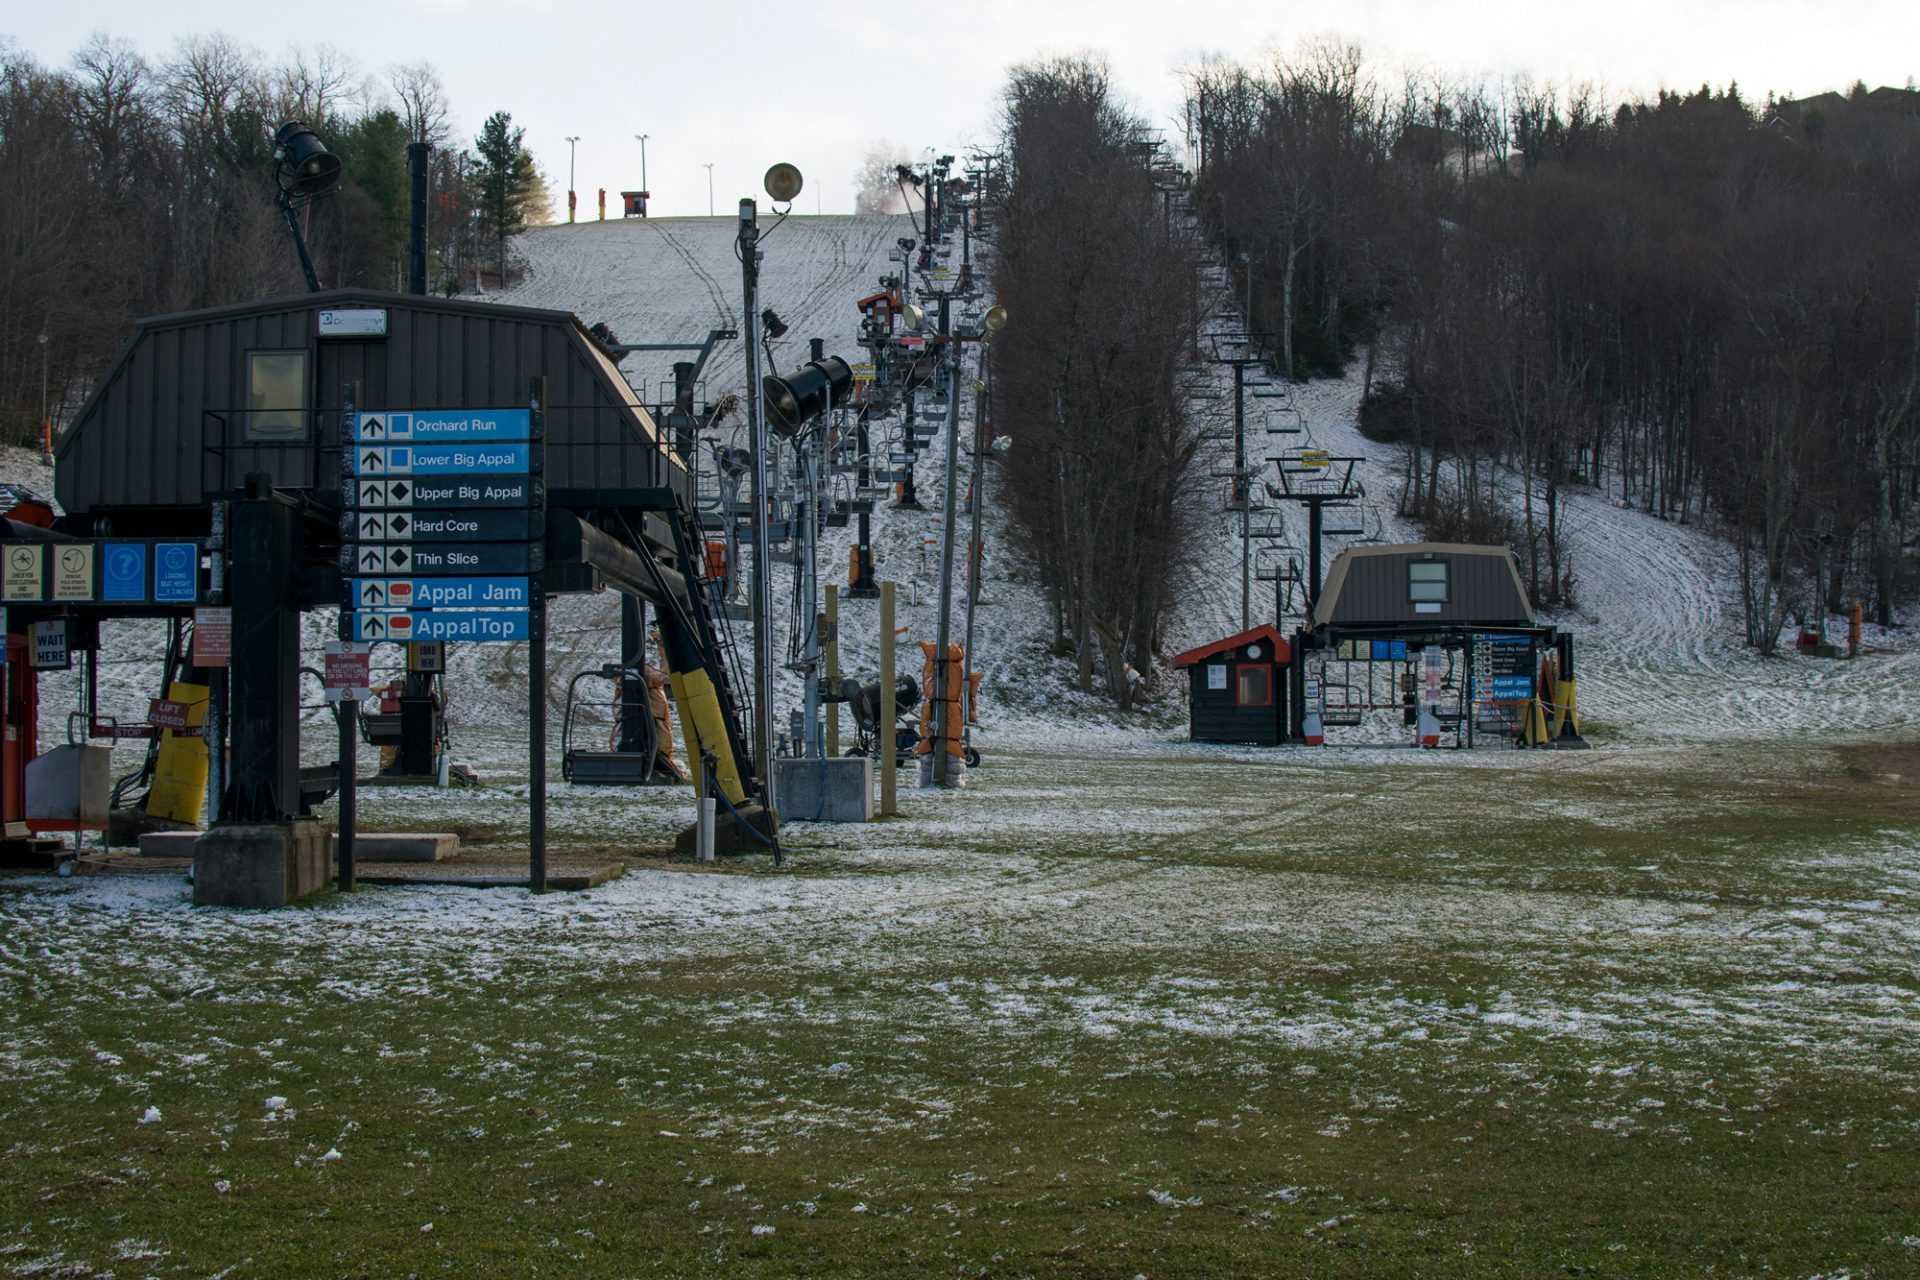 Appalachian Ski Mountain waits to open for winter